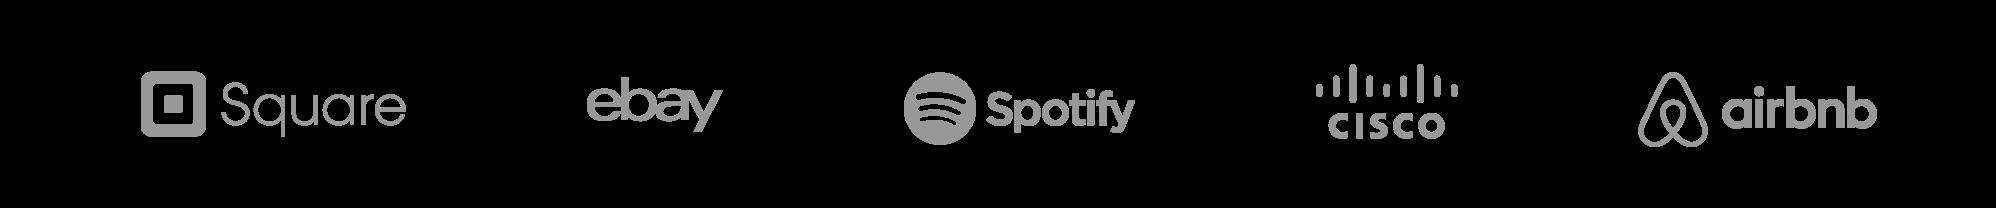 JIRA Customers: Square, Ebay, Spotify, Cisco, LinkedIn